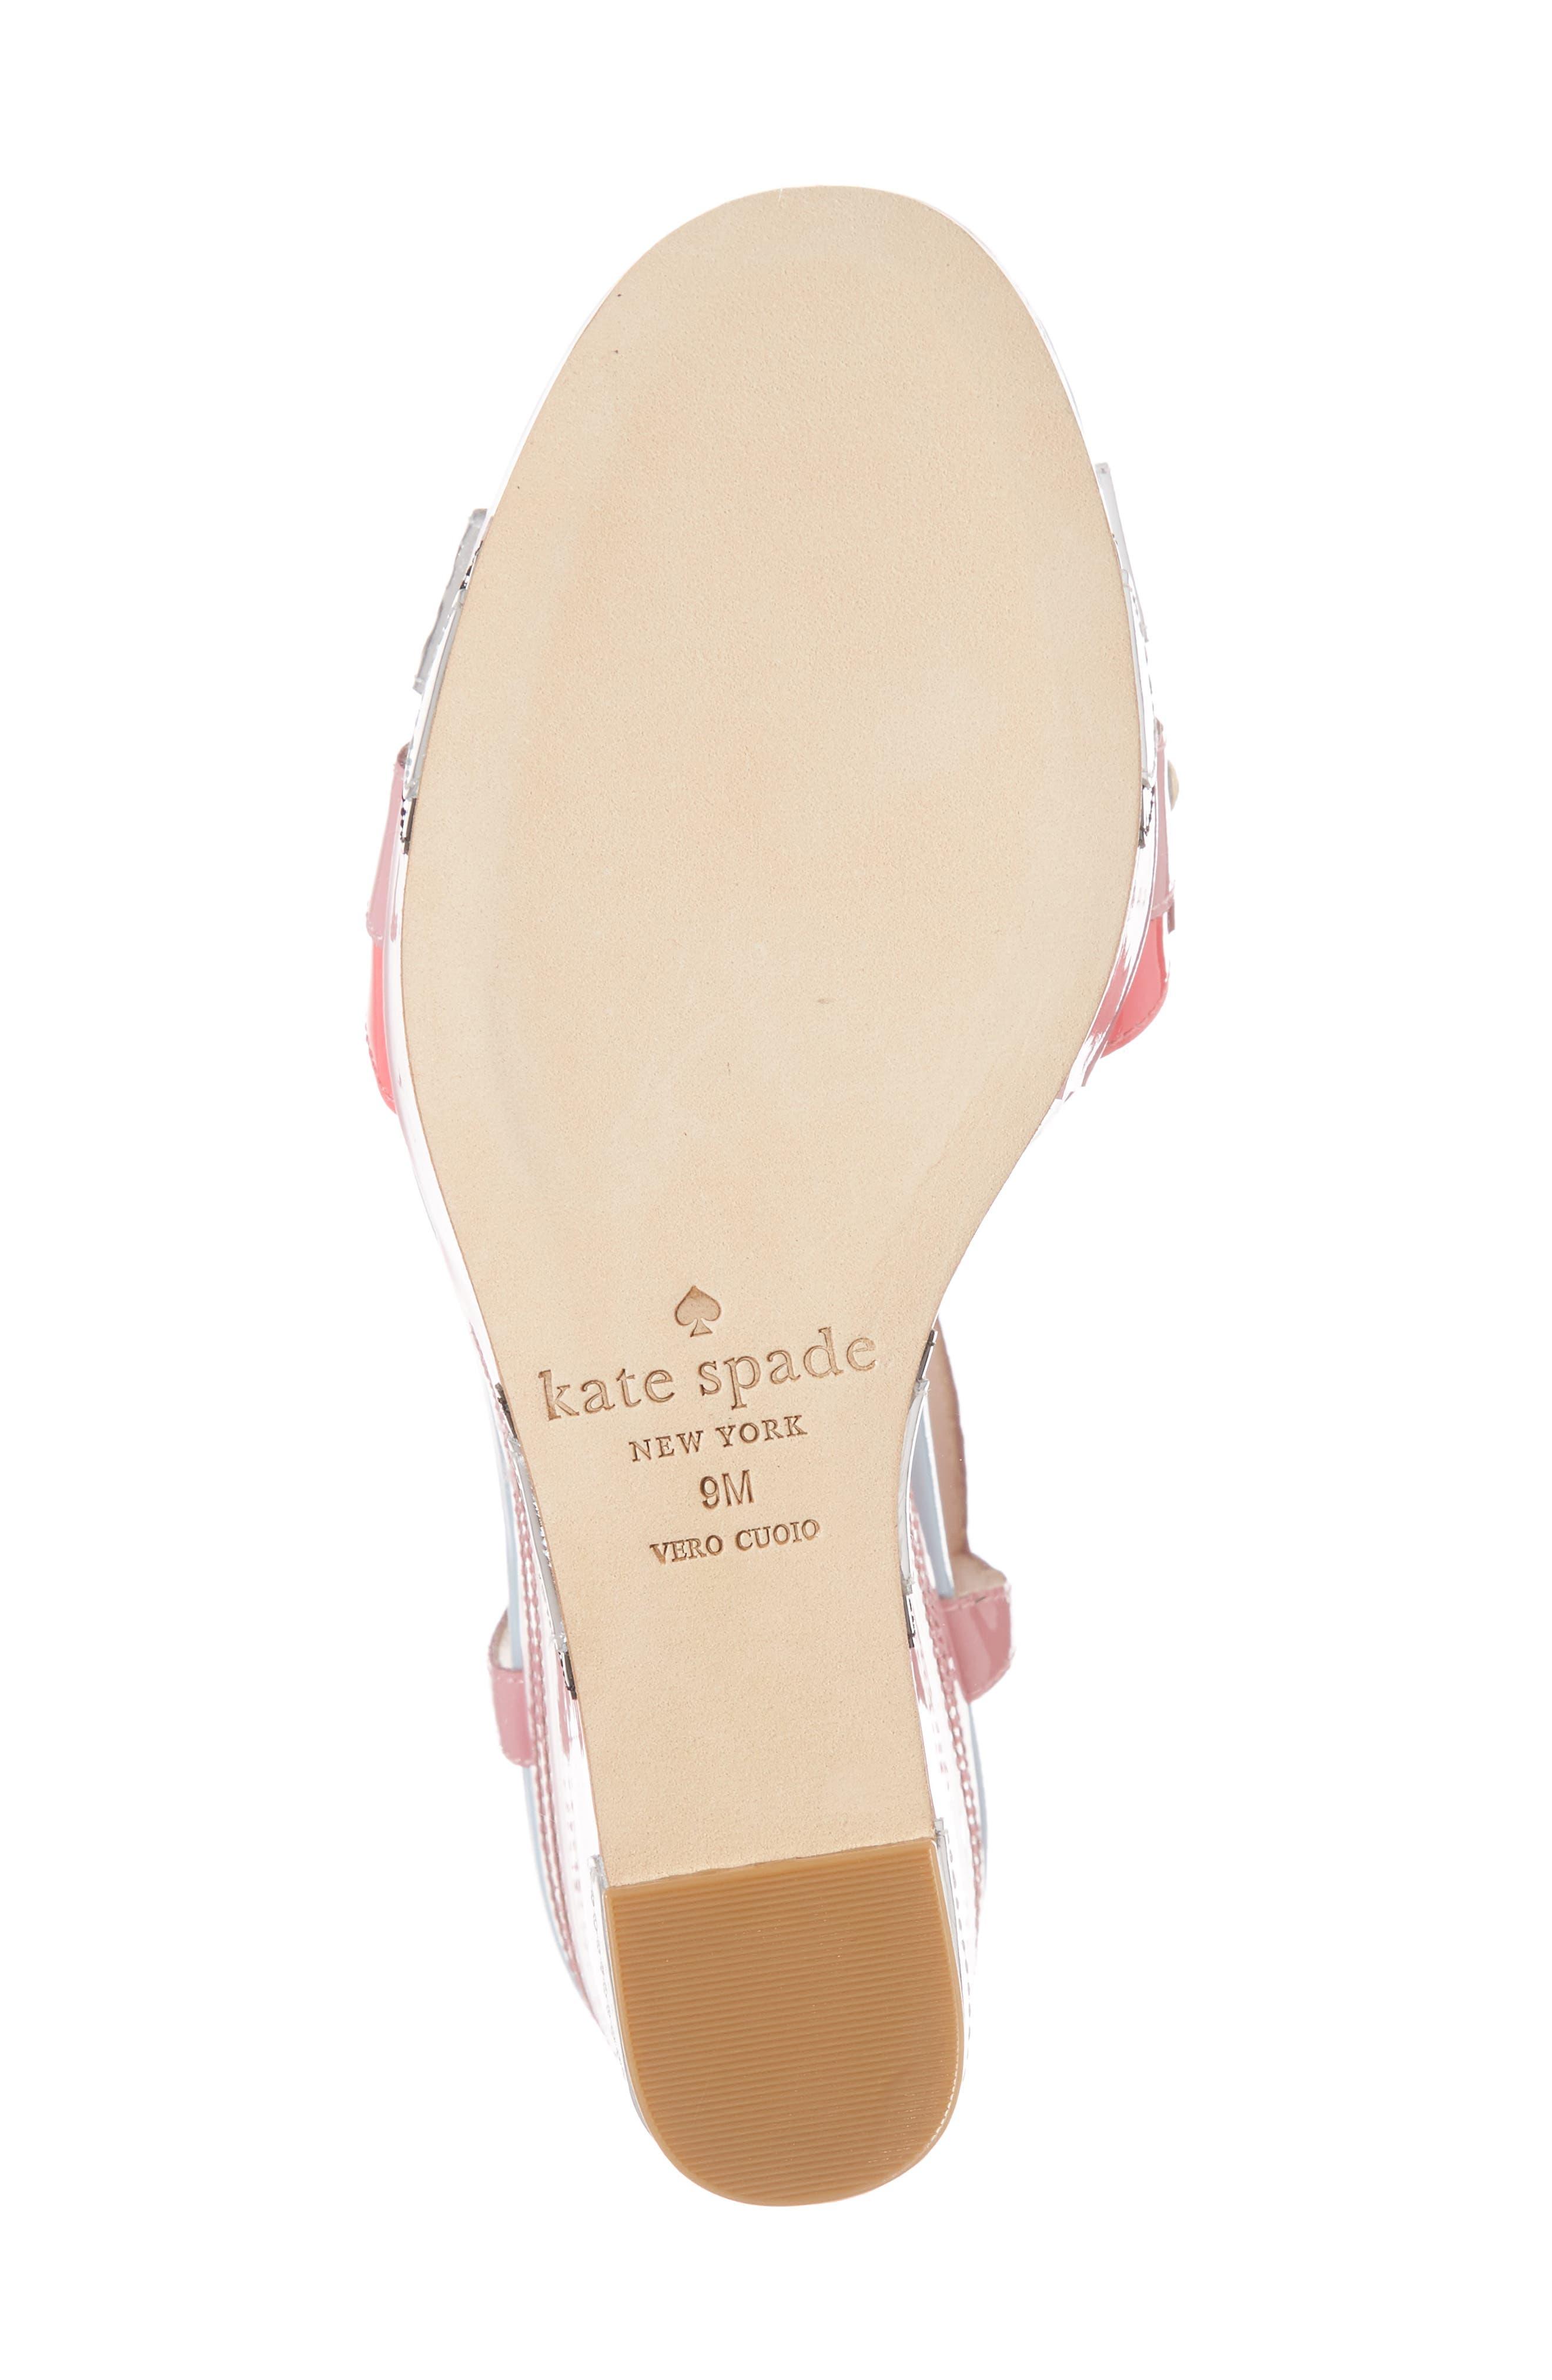 deanna wedge t-strap sandal,                             Alternate thumbnail 6, color,                             Petunia Patent